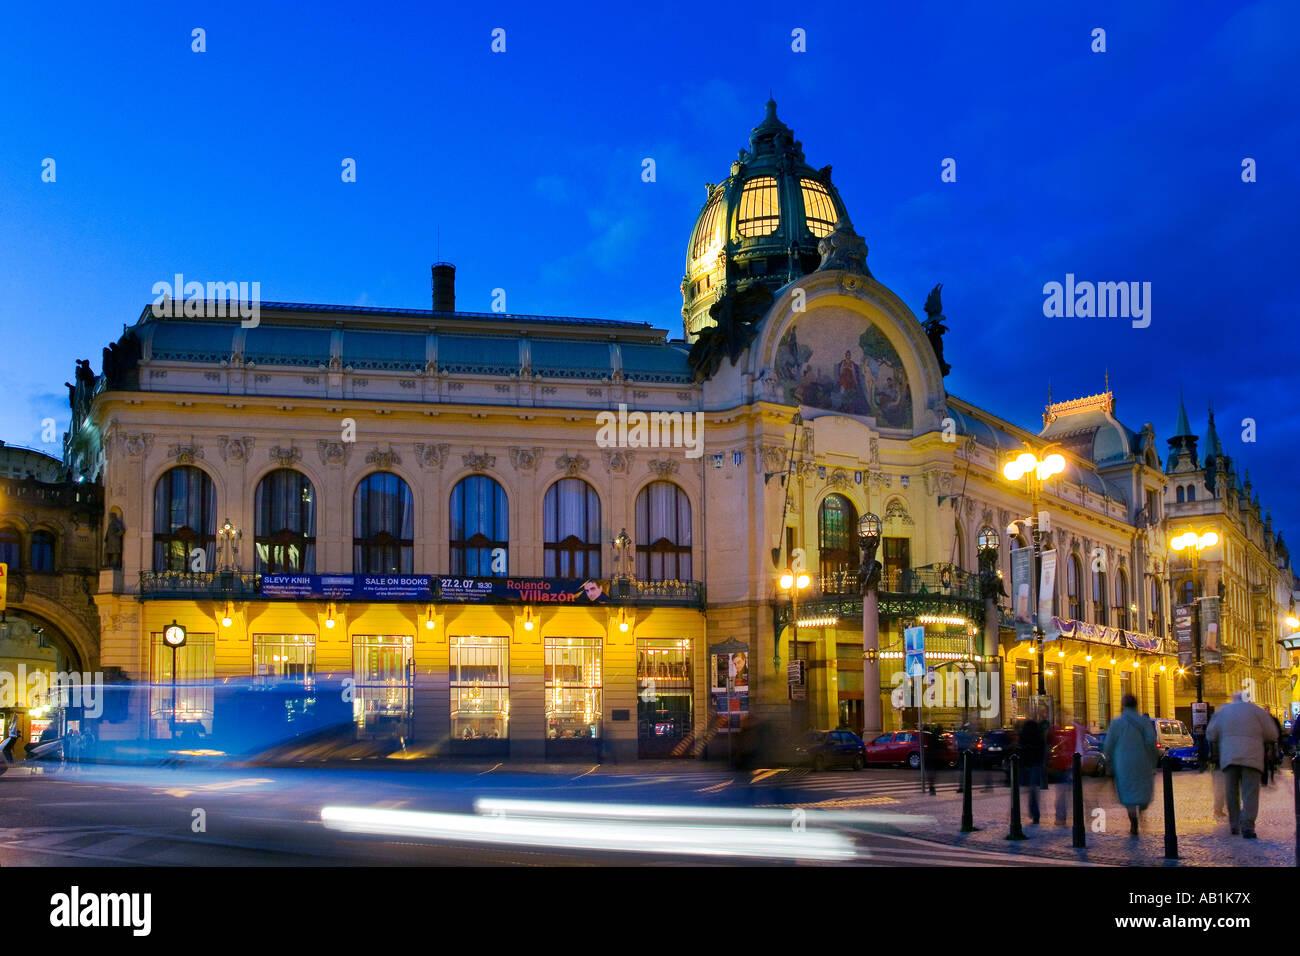 Obecni dum Stare Mesto UNESCO Praha Ceska republika Stock Photo